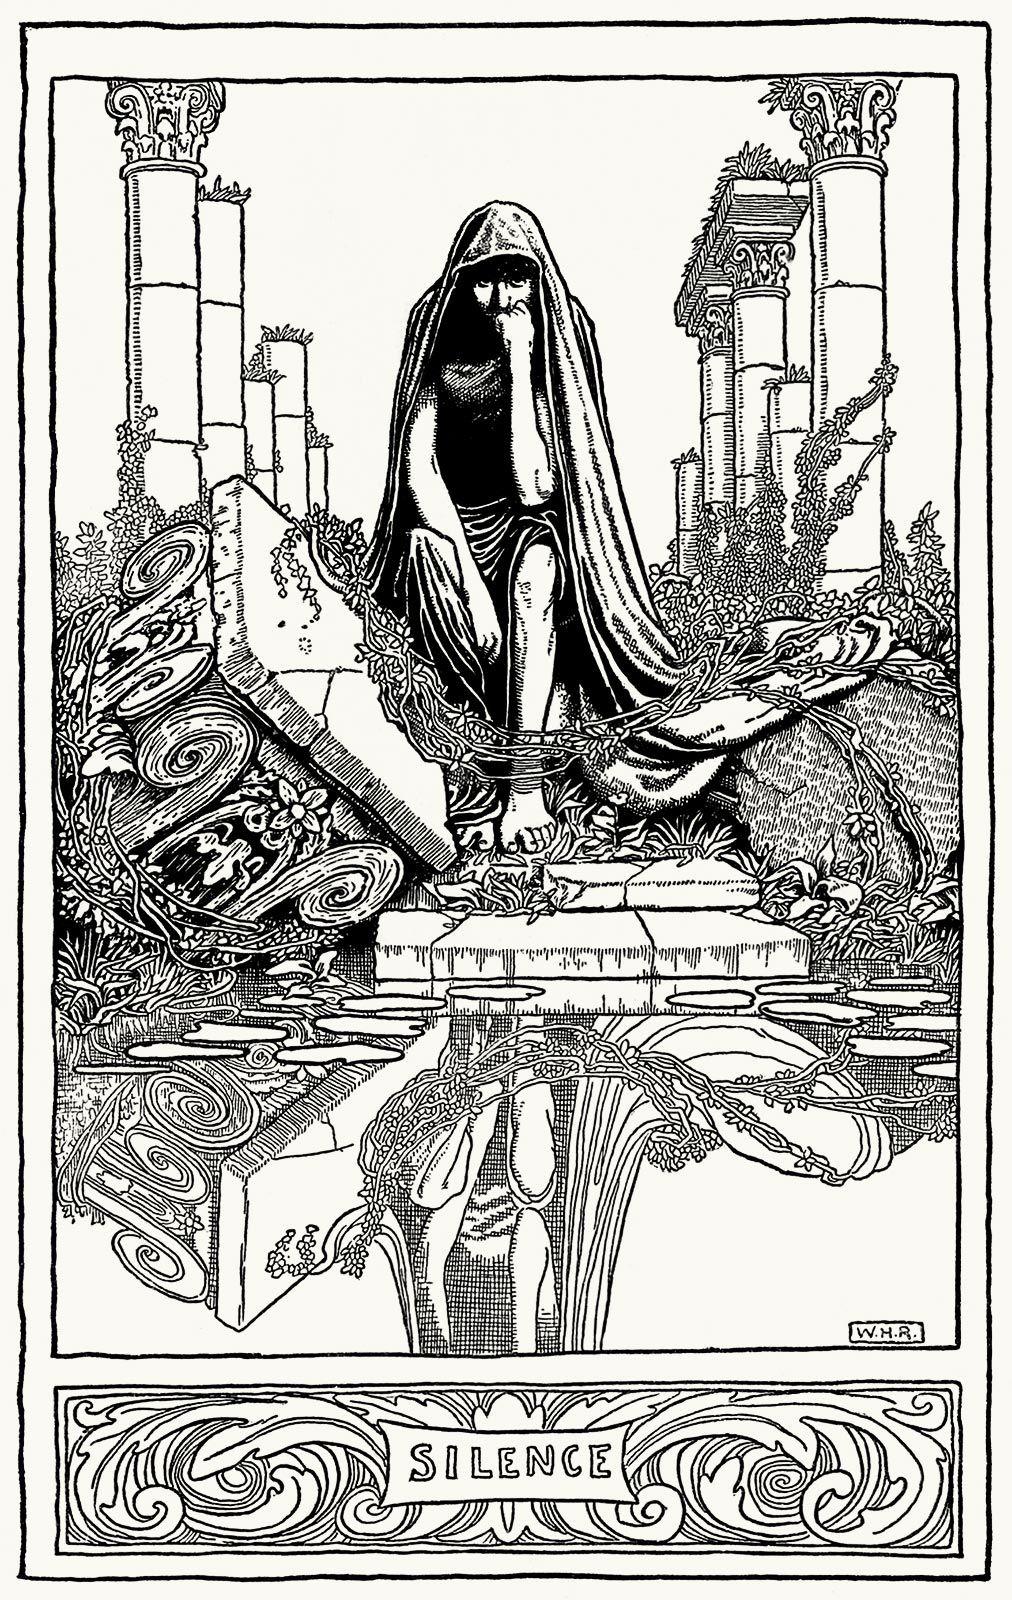 Silence. William Heath Robinson, from The poems of Edgar